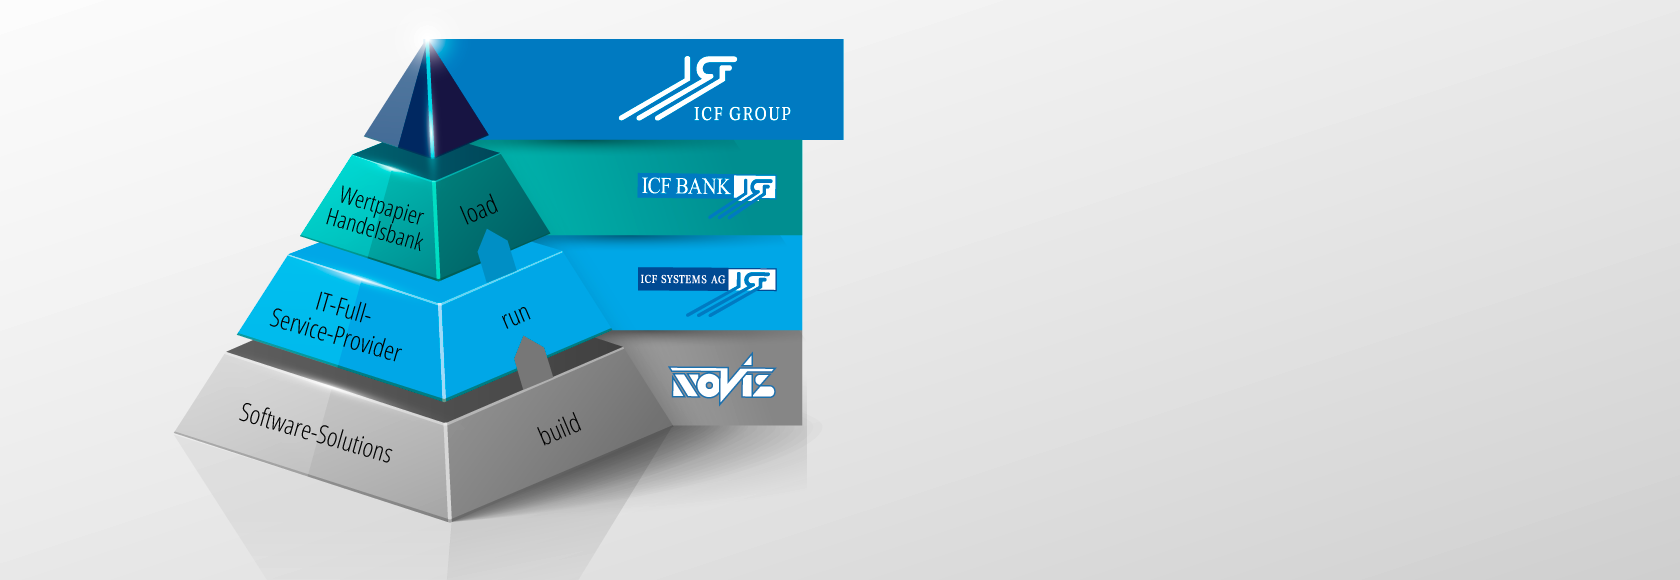 icfgroup3